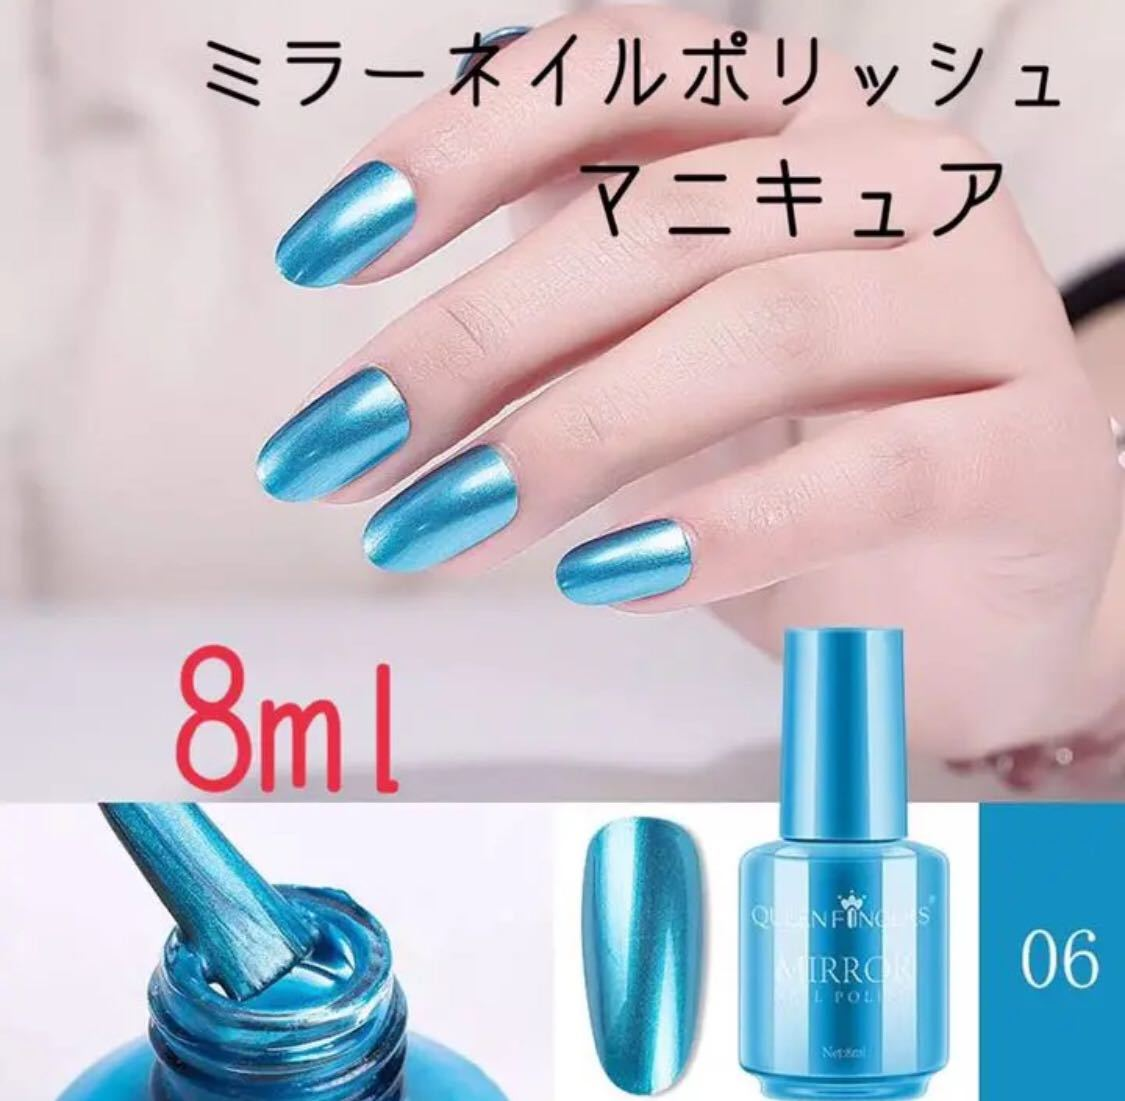 Queen fingers ミラーネイルポリッシュ メタリックマニキュア#06ブルー